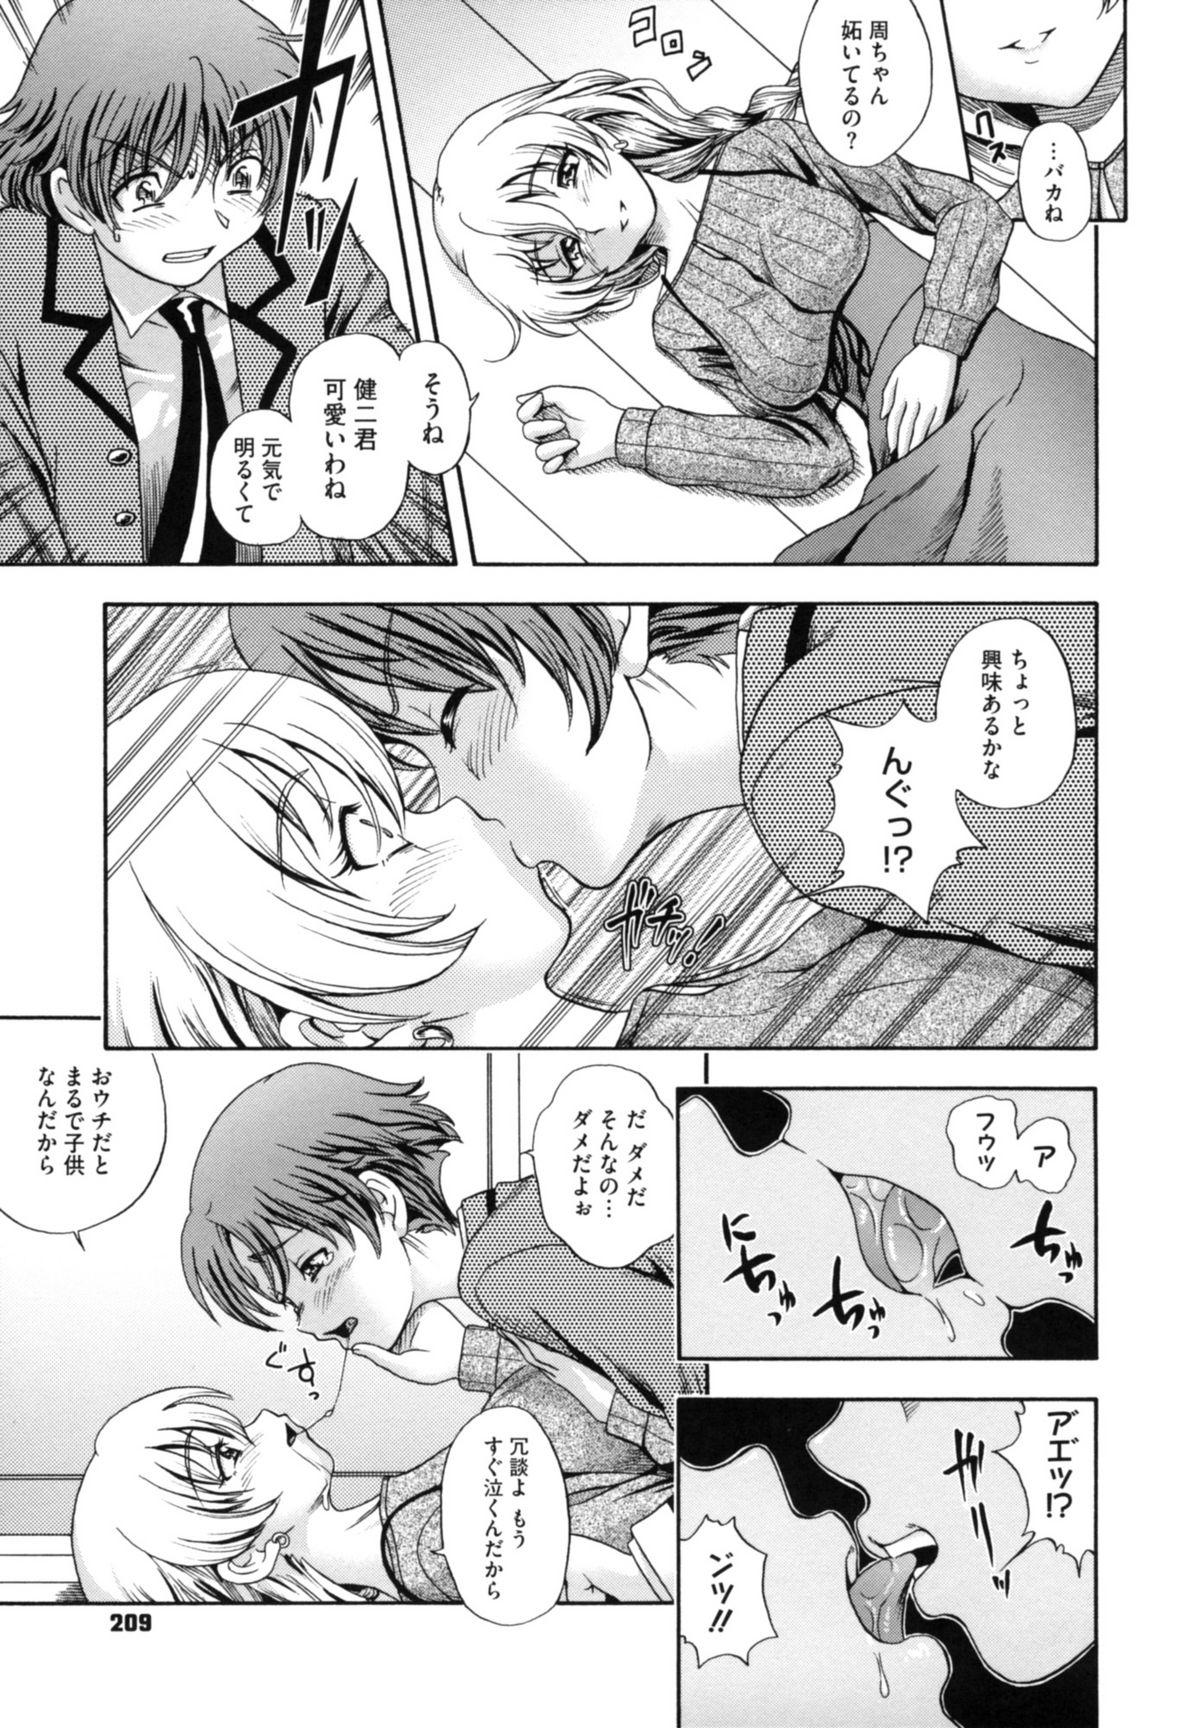 Soushisouai Note Nisatsume 218